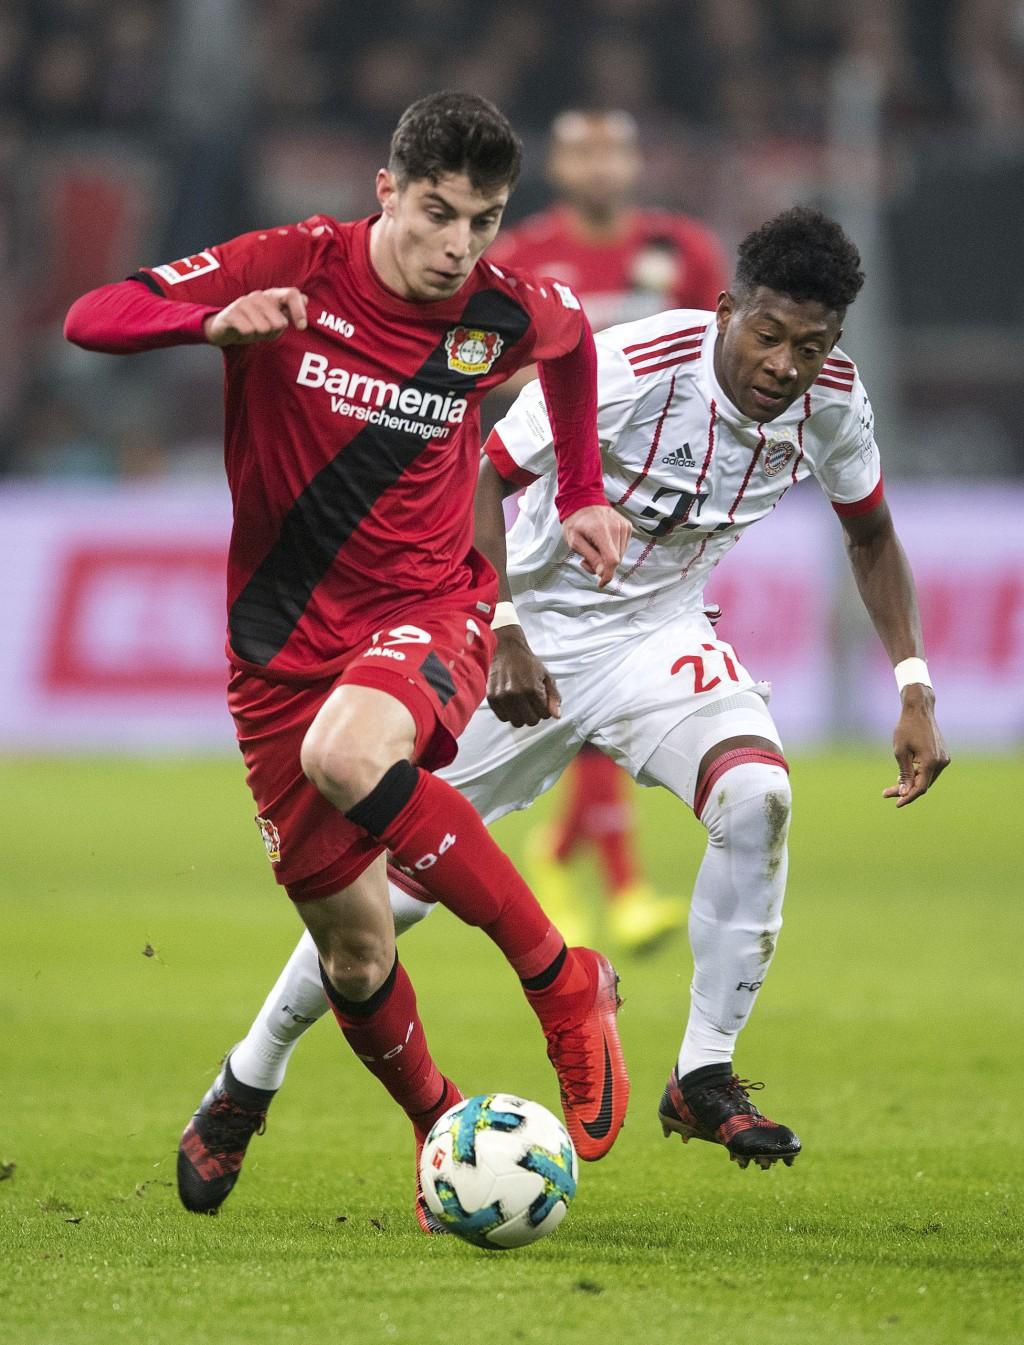 Leverkusen's Kai Havertz and Bayern's David Alaba, right, in action during the German Bundesliga soccer match between Bayer Leverkusen and Bayern Muni